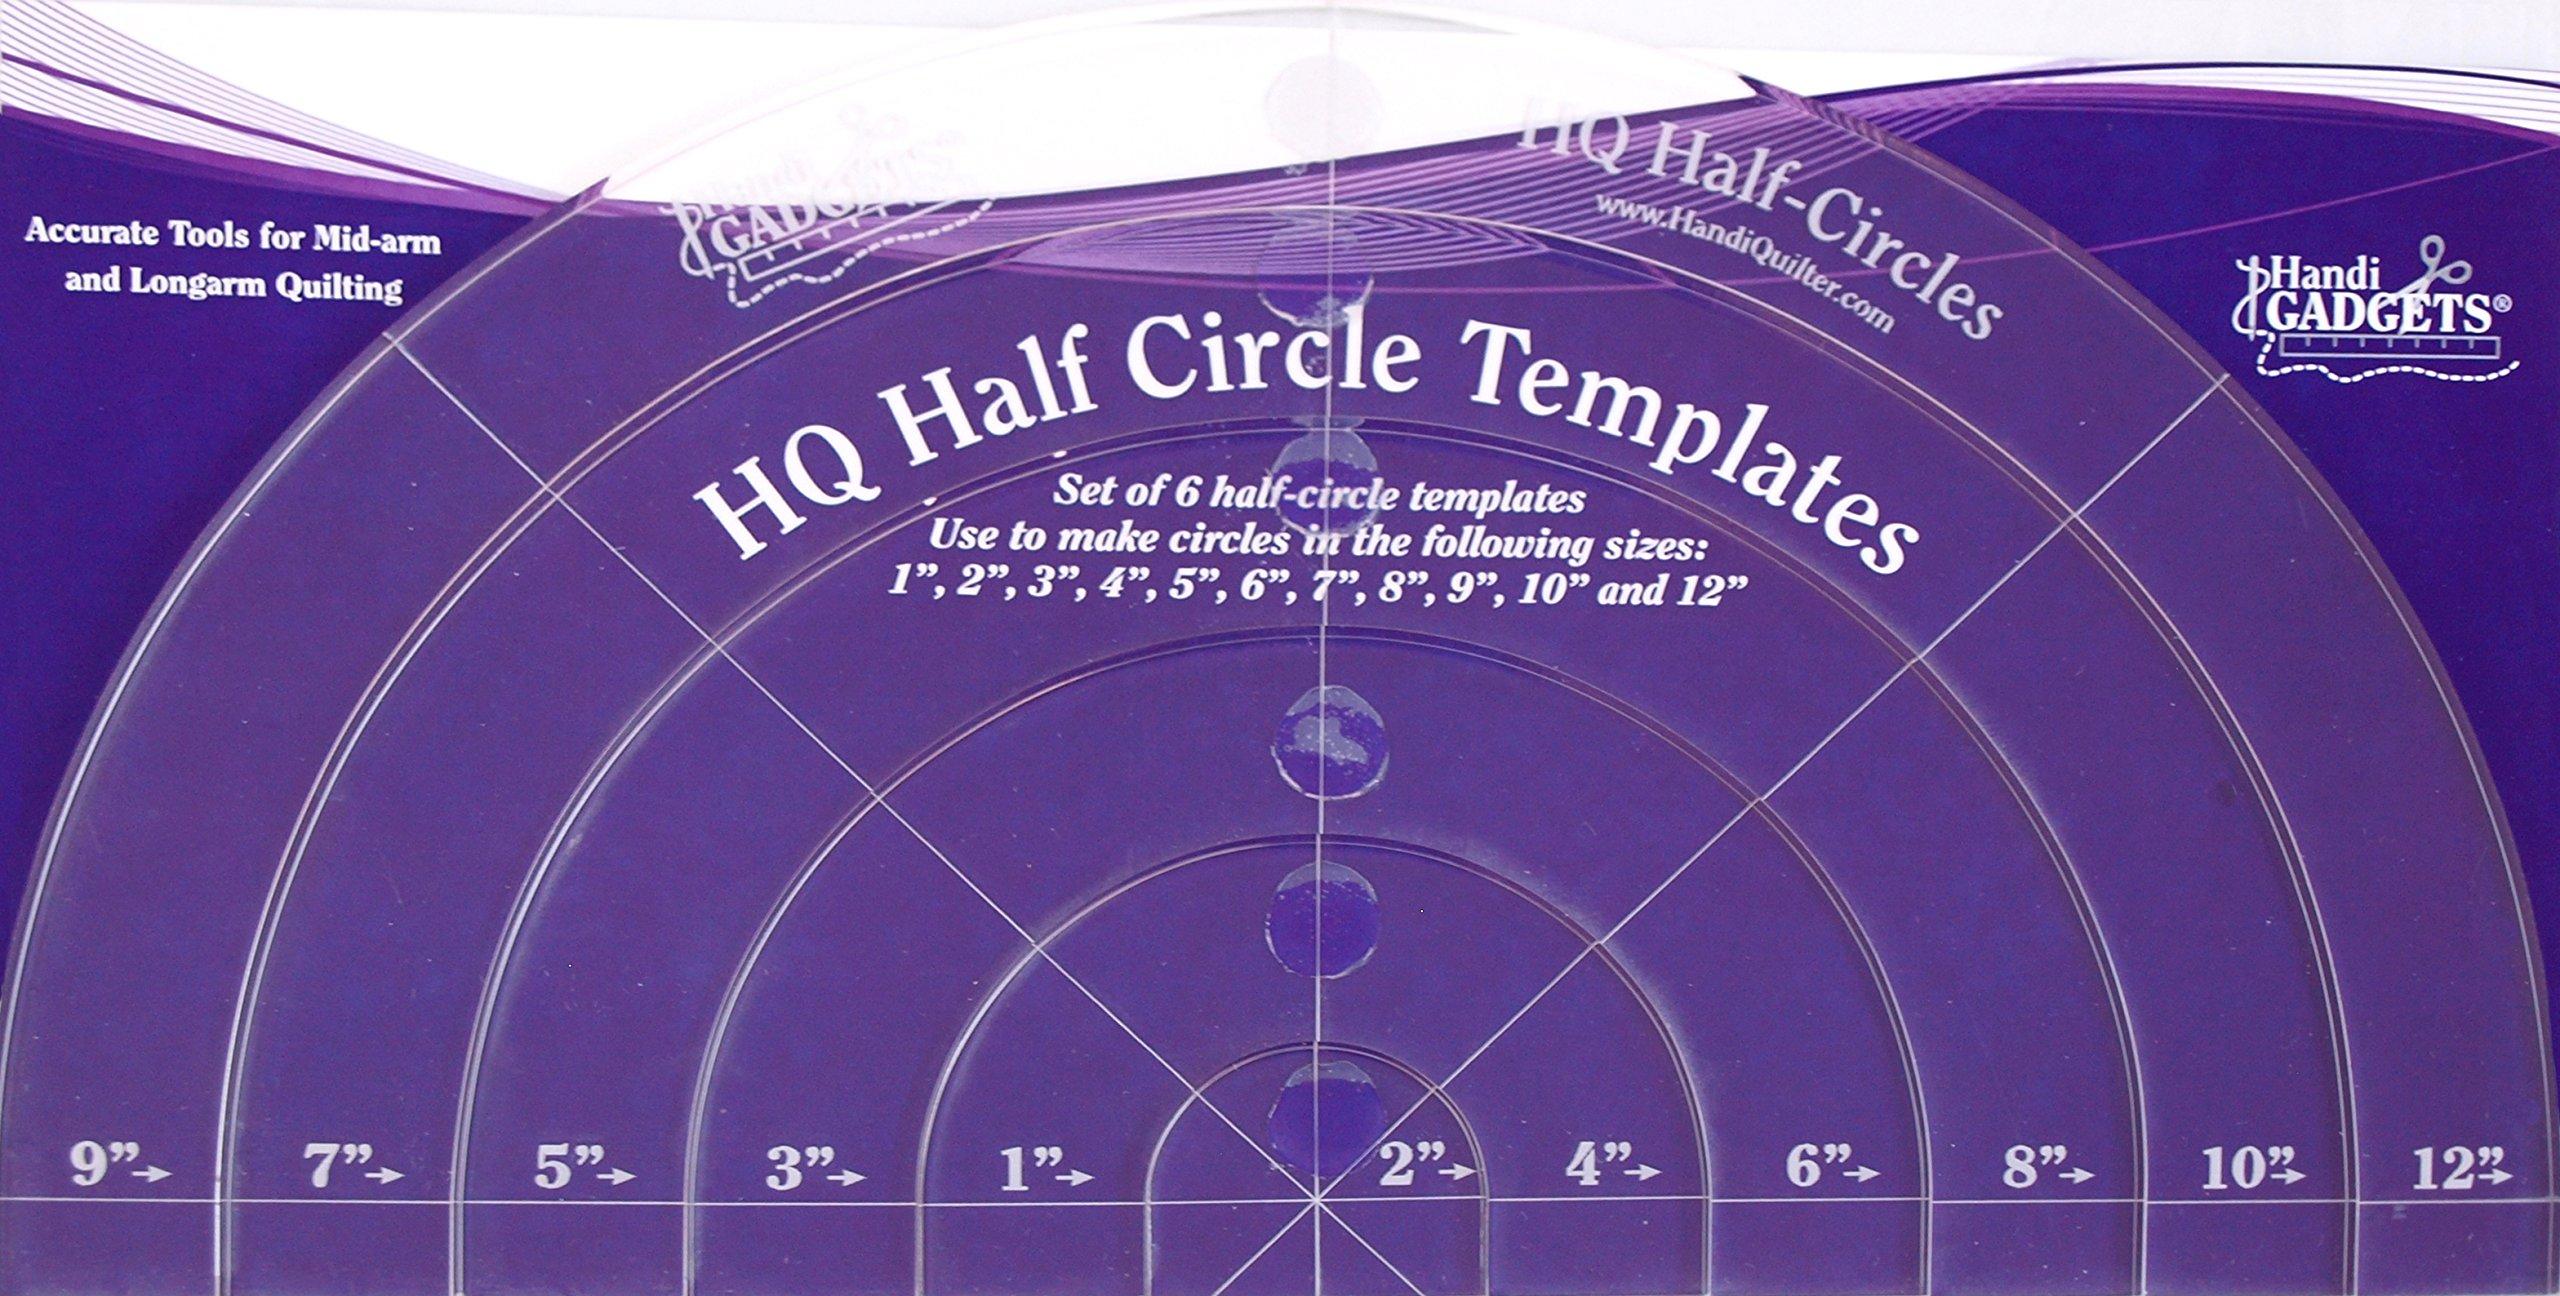 Handi Quilter Half-Circle Templates by Handi Quilter, Inc